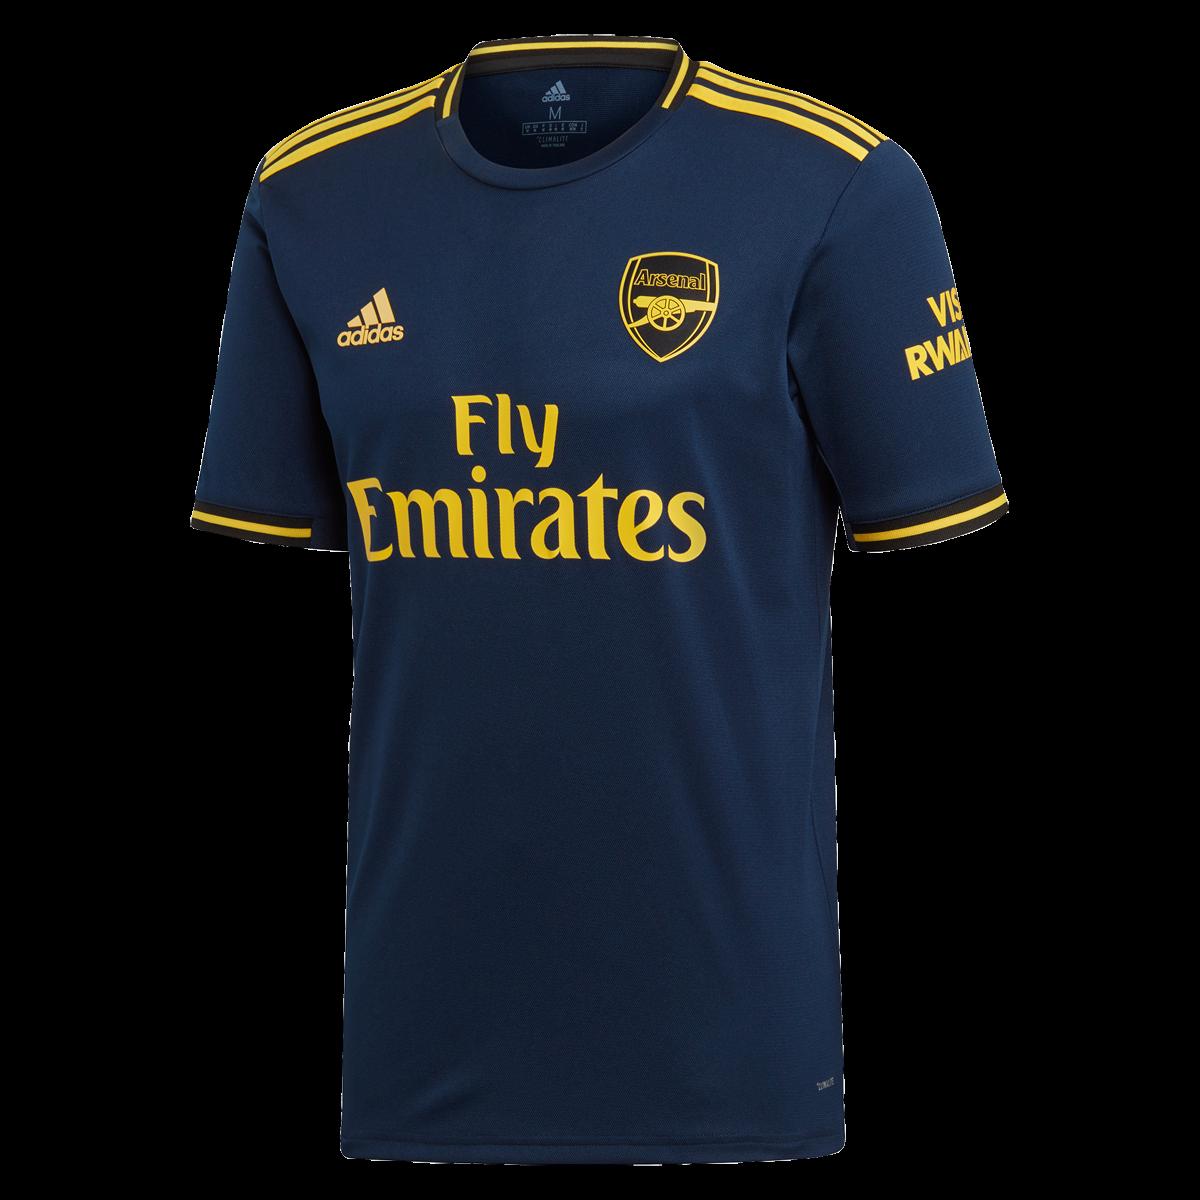 adidas Arsenal Third Jersey 19/20-2xl | サッカー